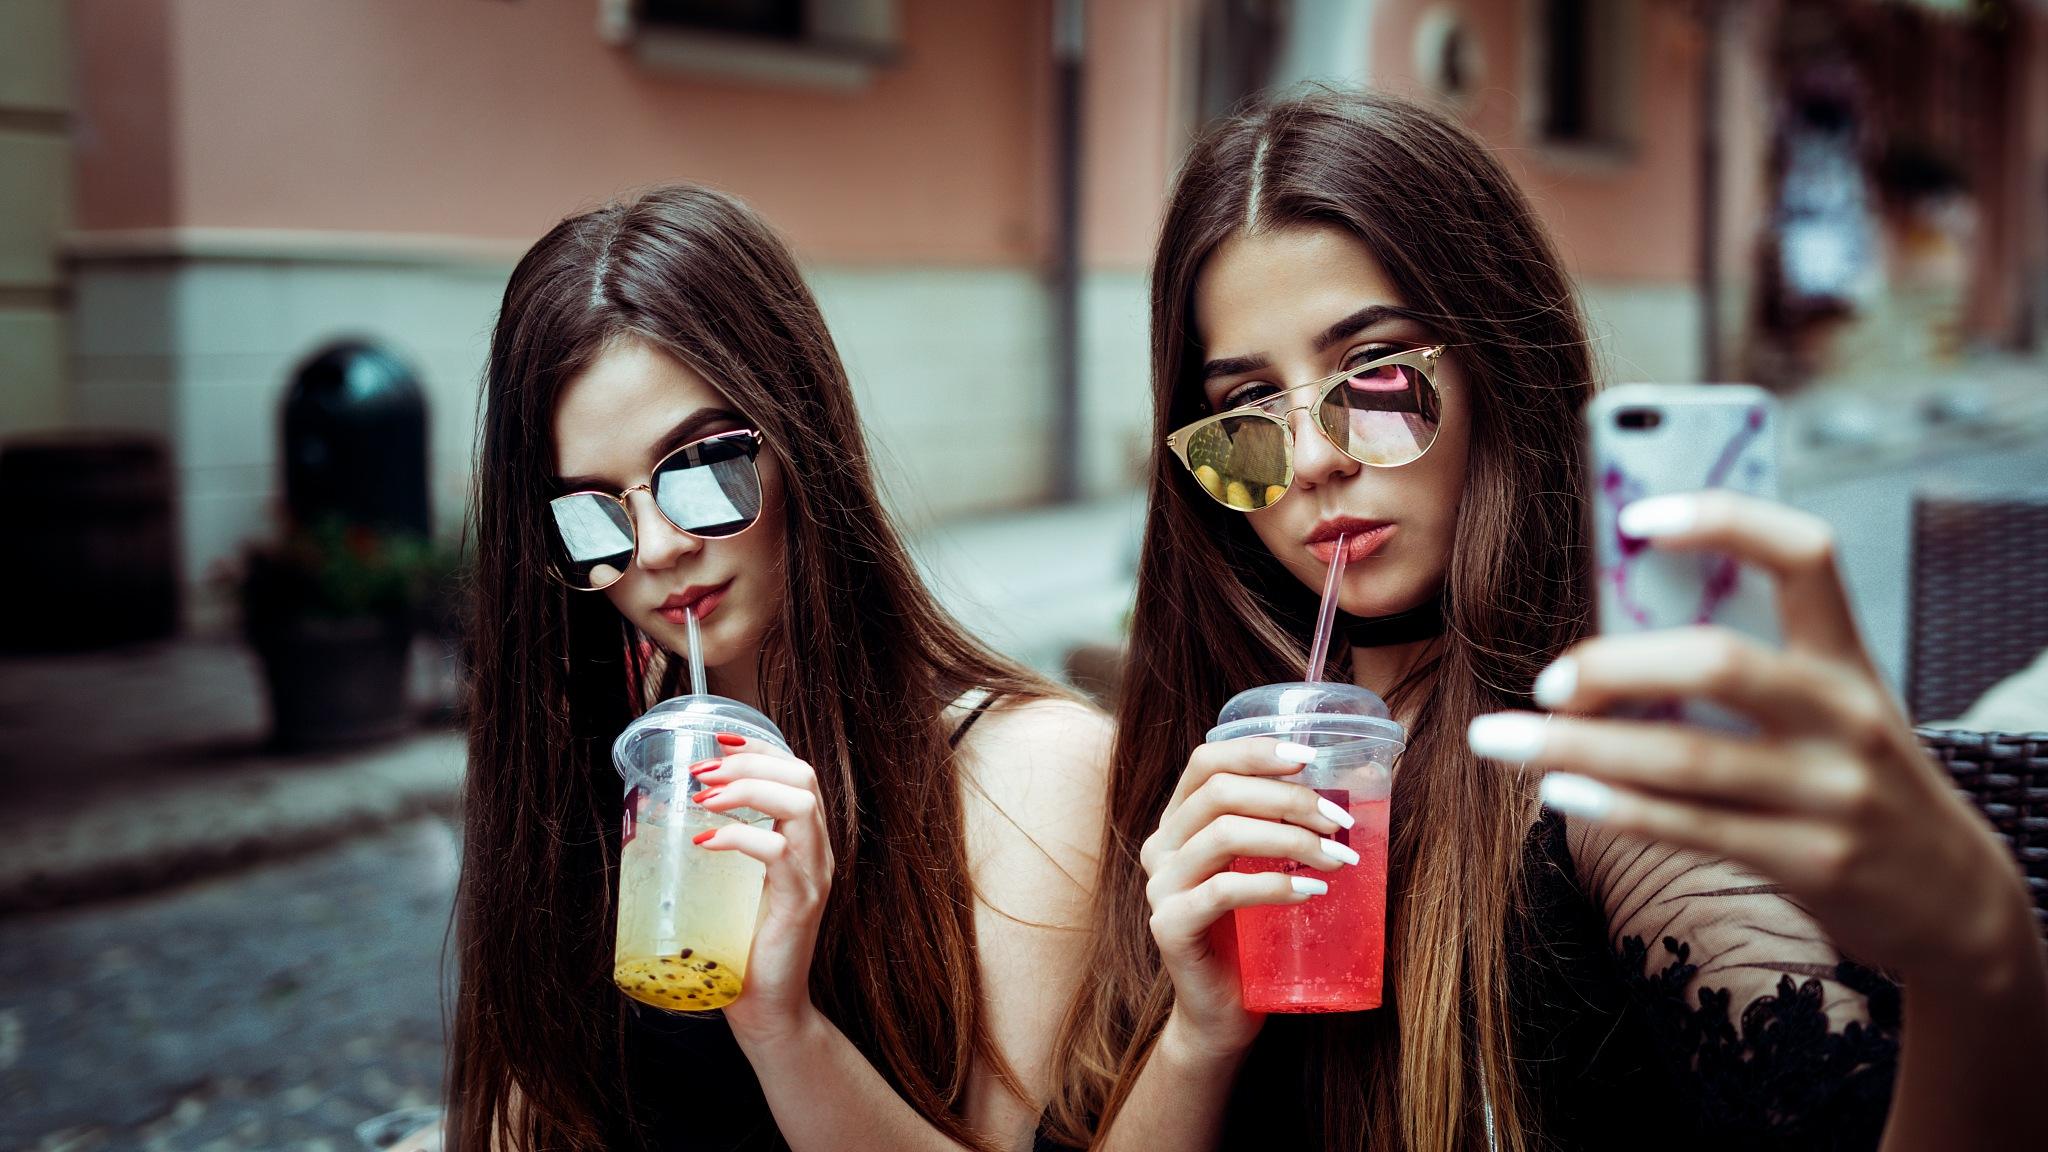 Two instagram girl by Elijah